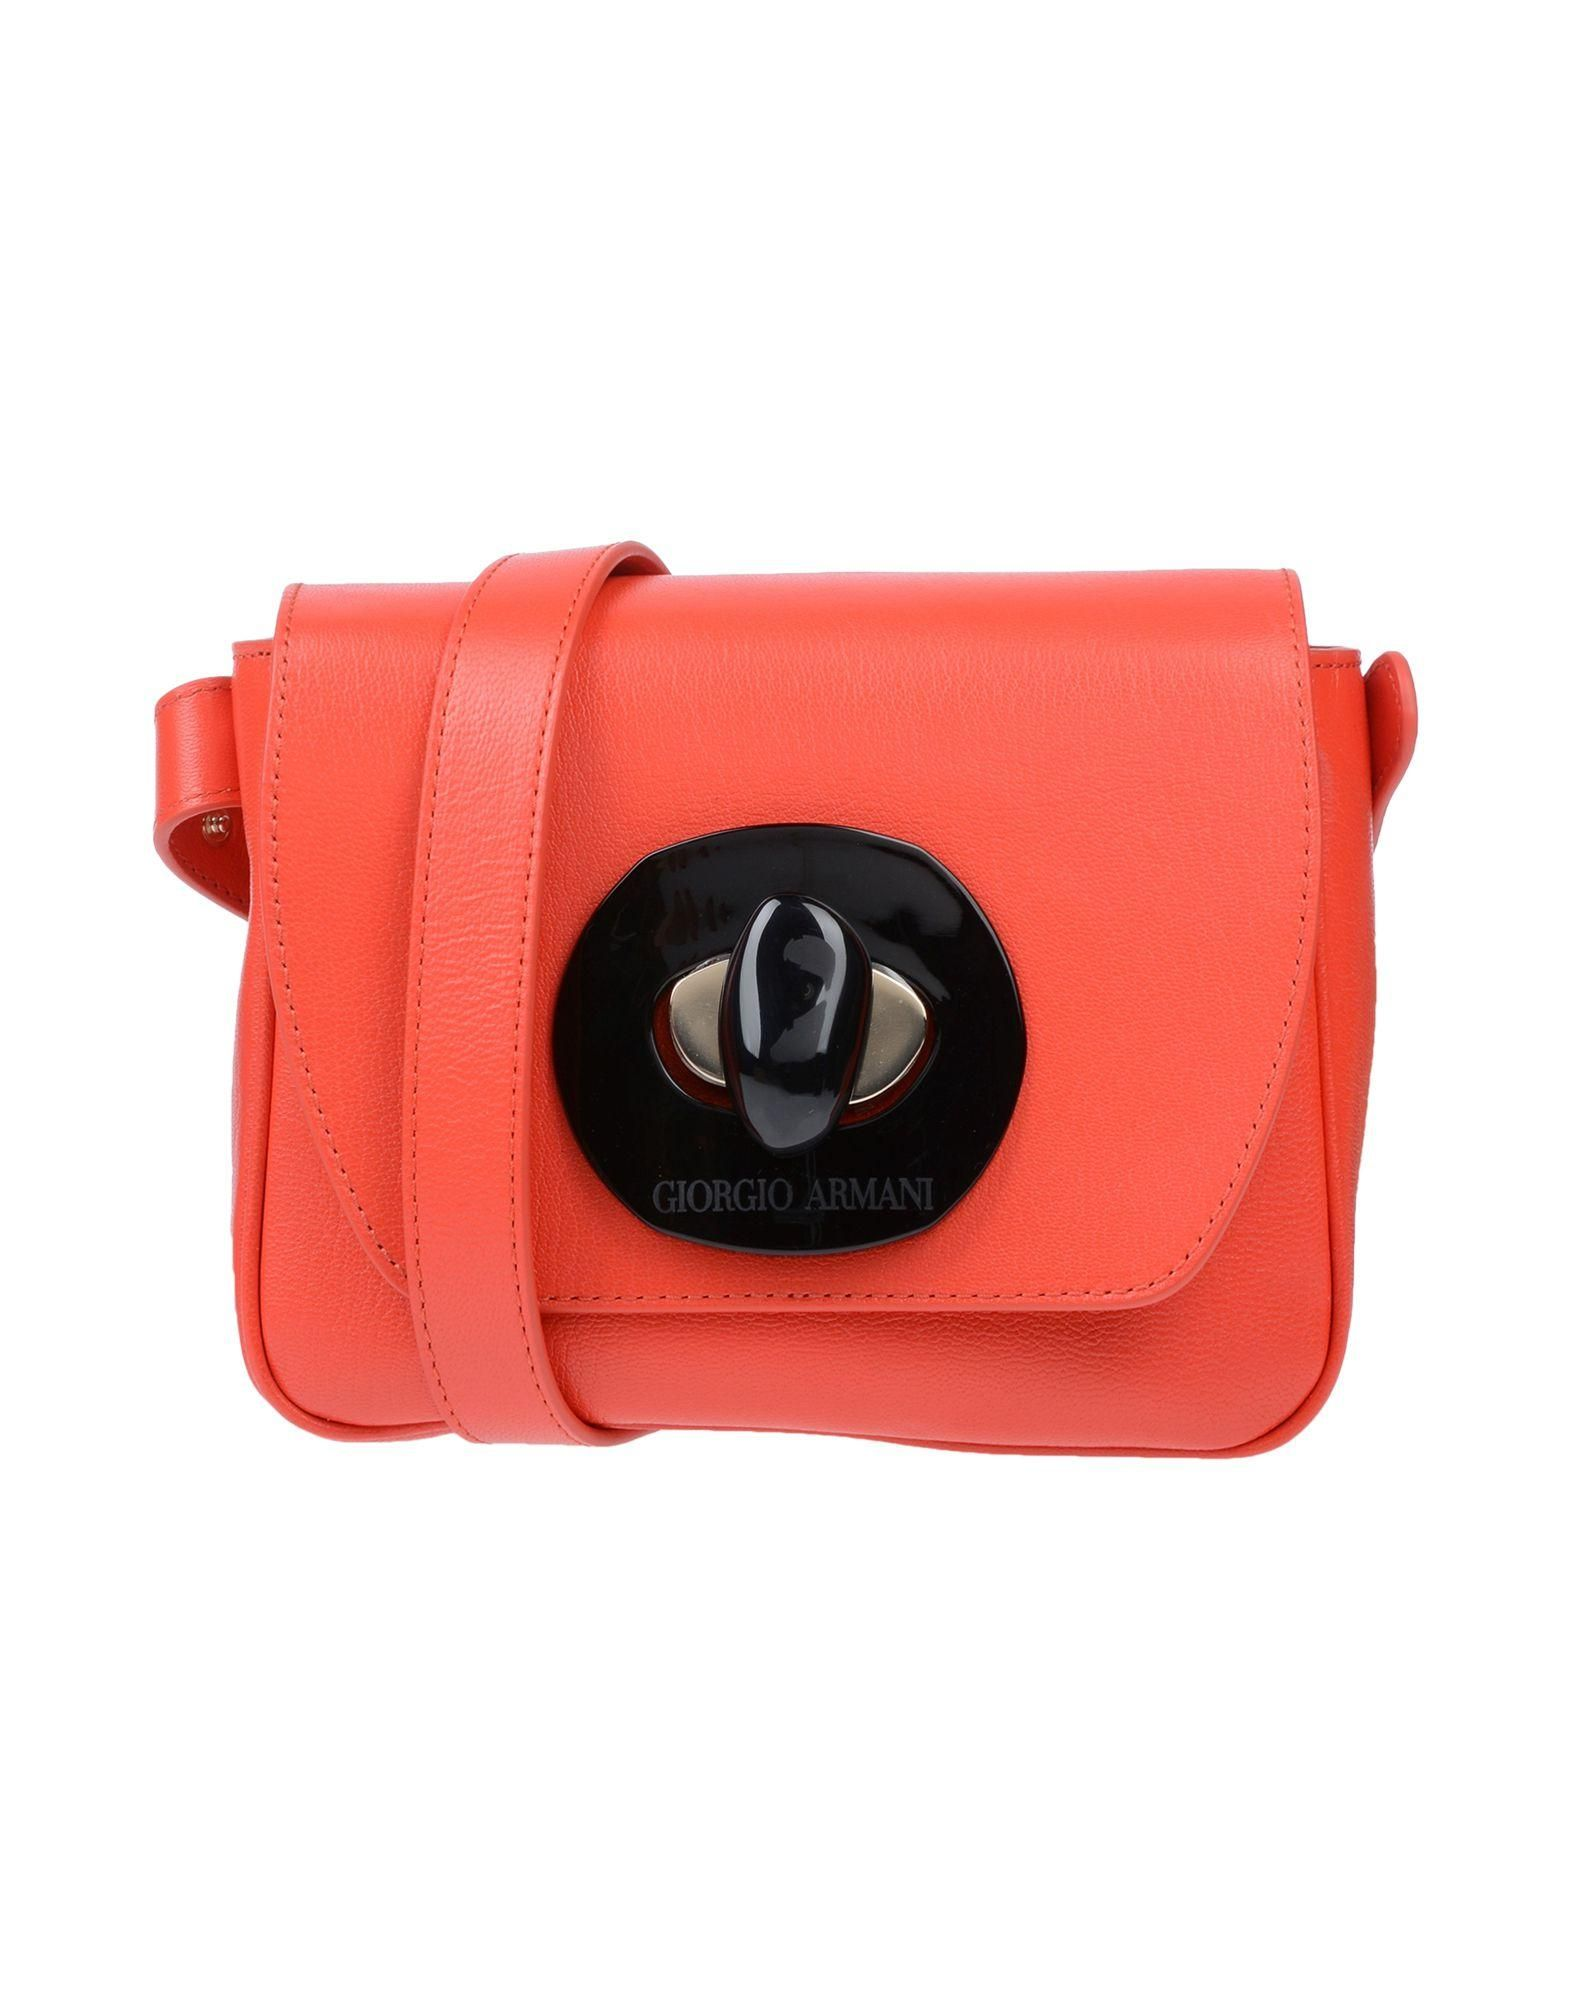 3ceded1bcef71 Women's Red Cross-body Bag in 2019 | 'things' | Crossbody bag ...